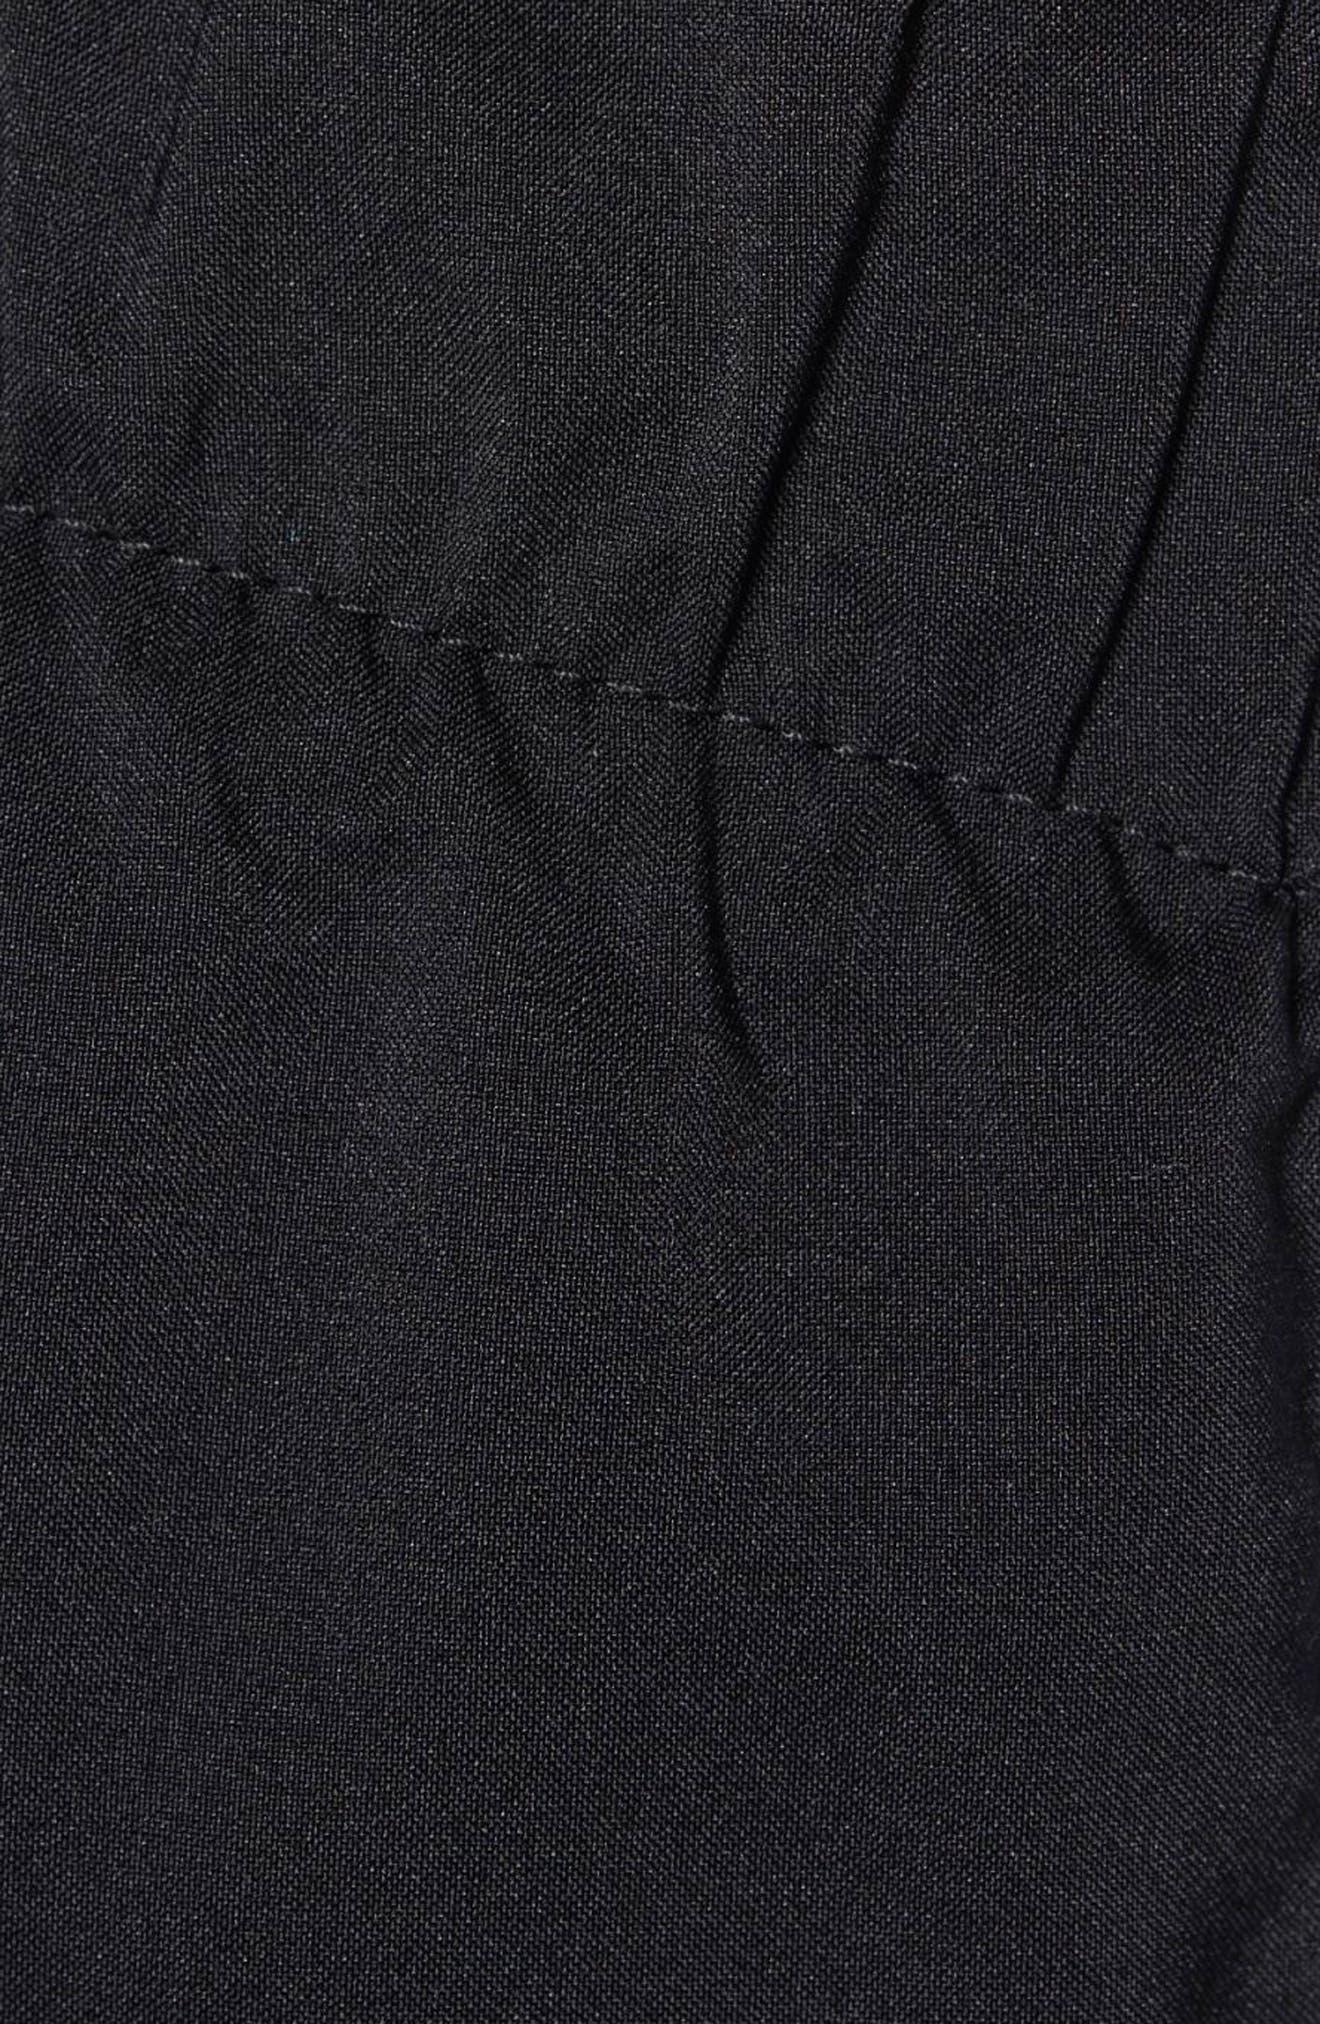 M10 Icon Running Shorts,                             Alternate thumbnail 6, color,                             001